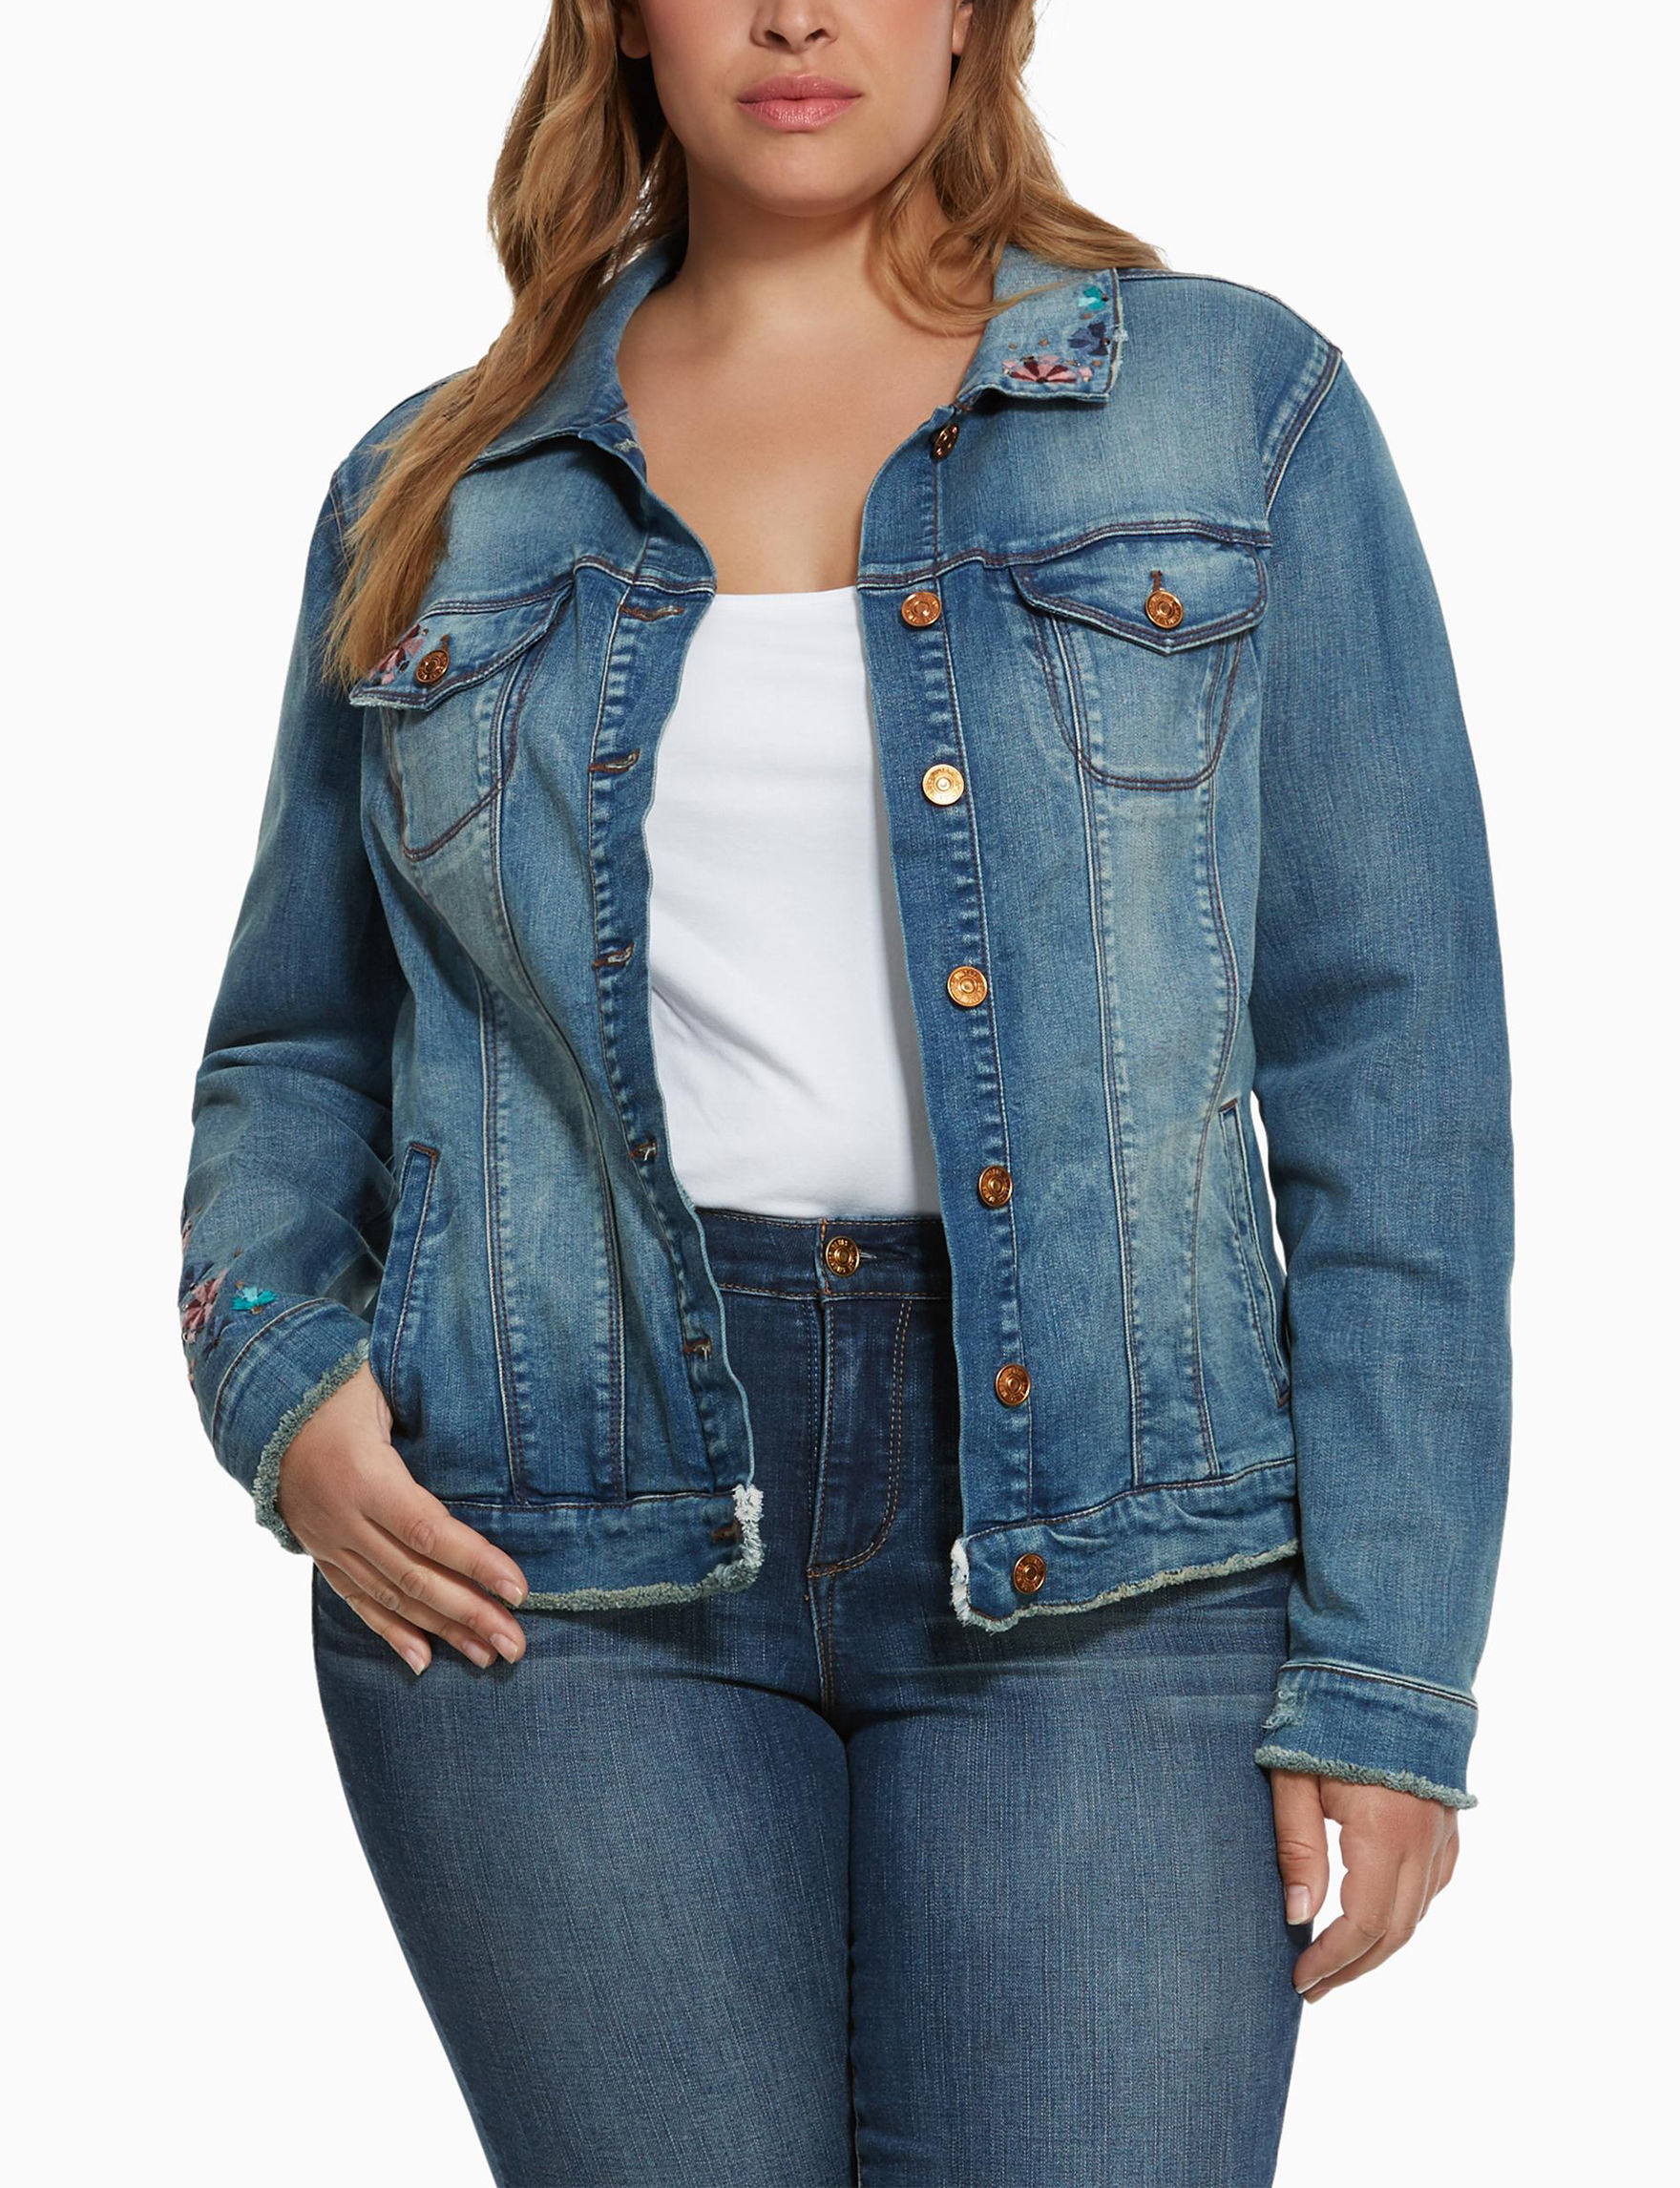 Vintage America Blues Blue Denim Jackets